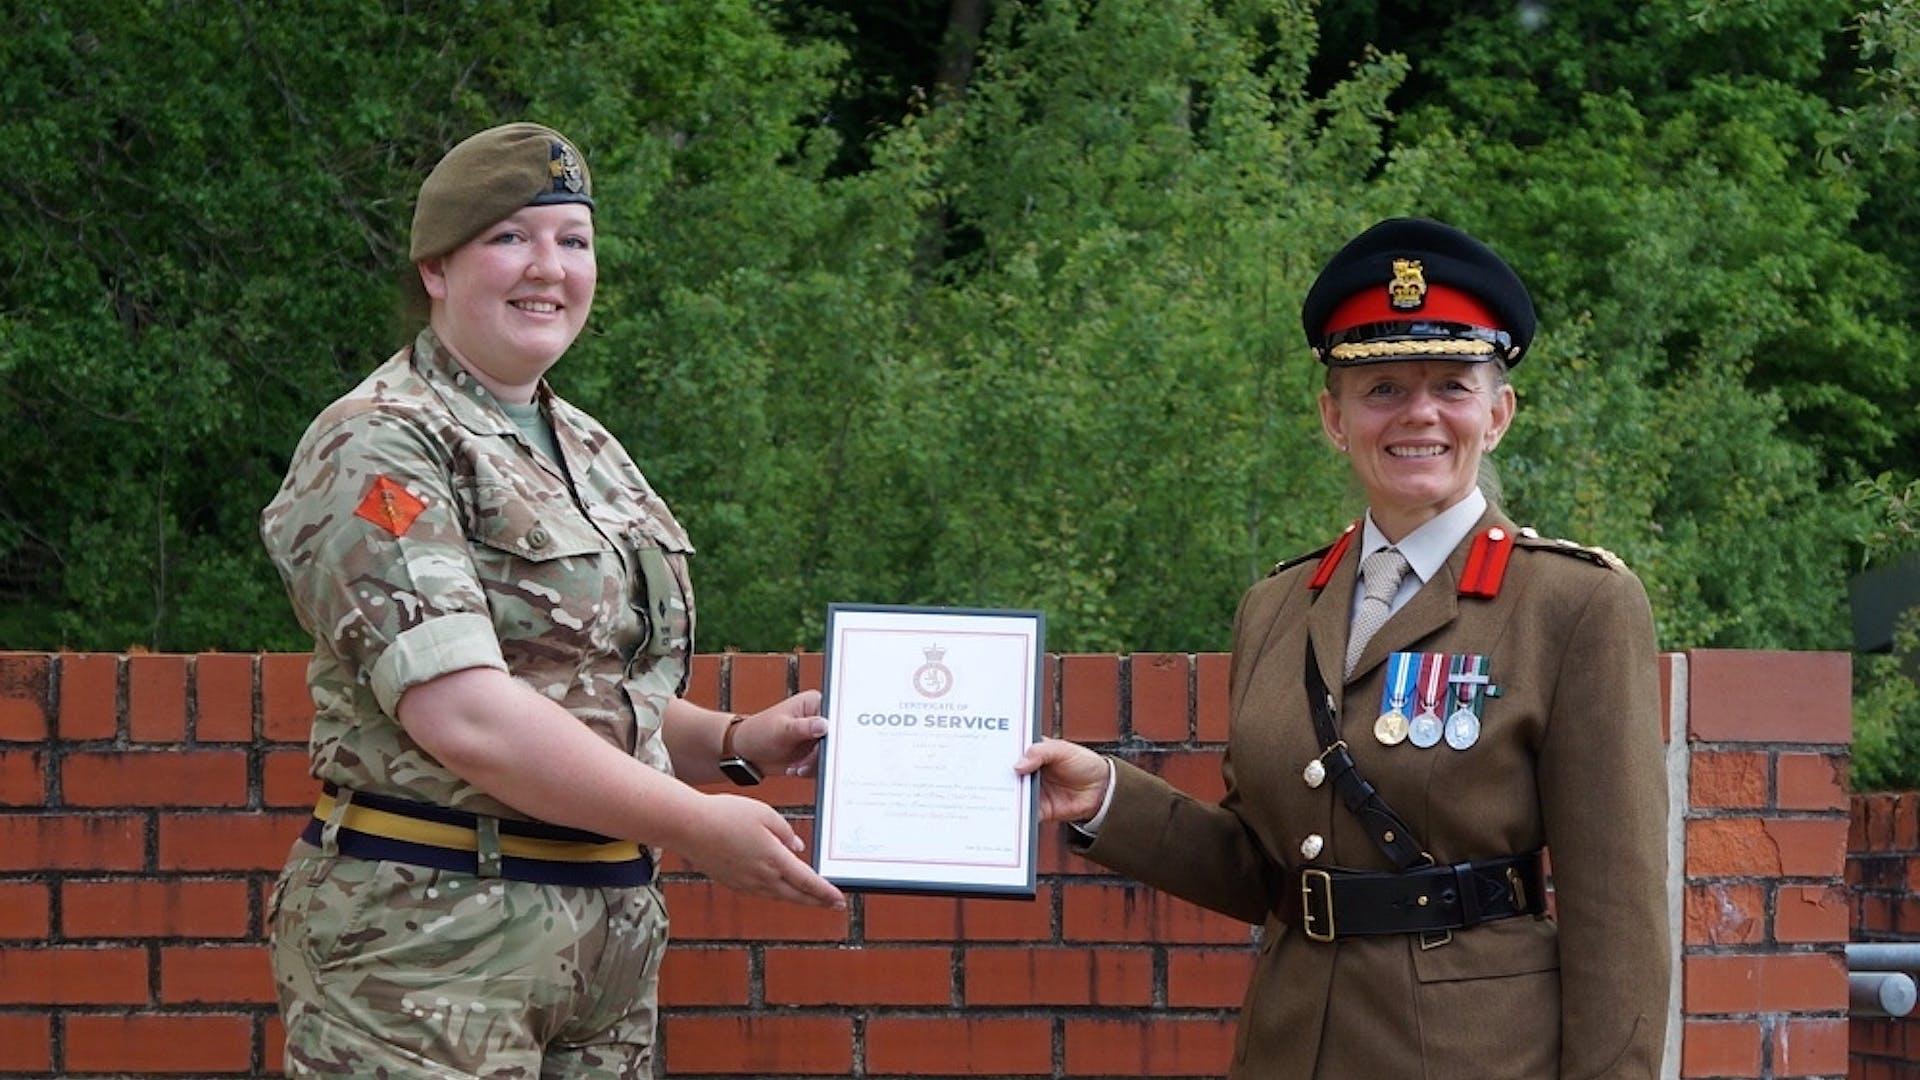 2 Lt Lanigan Certificate of Good Service